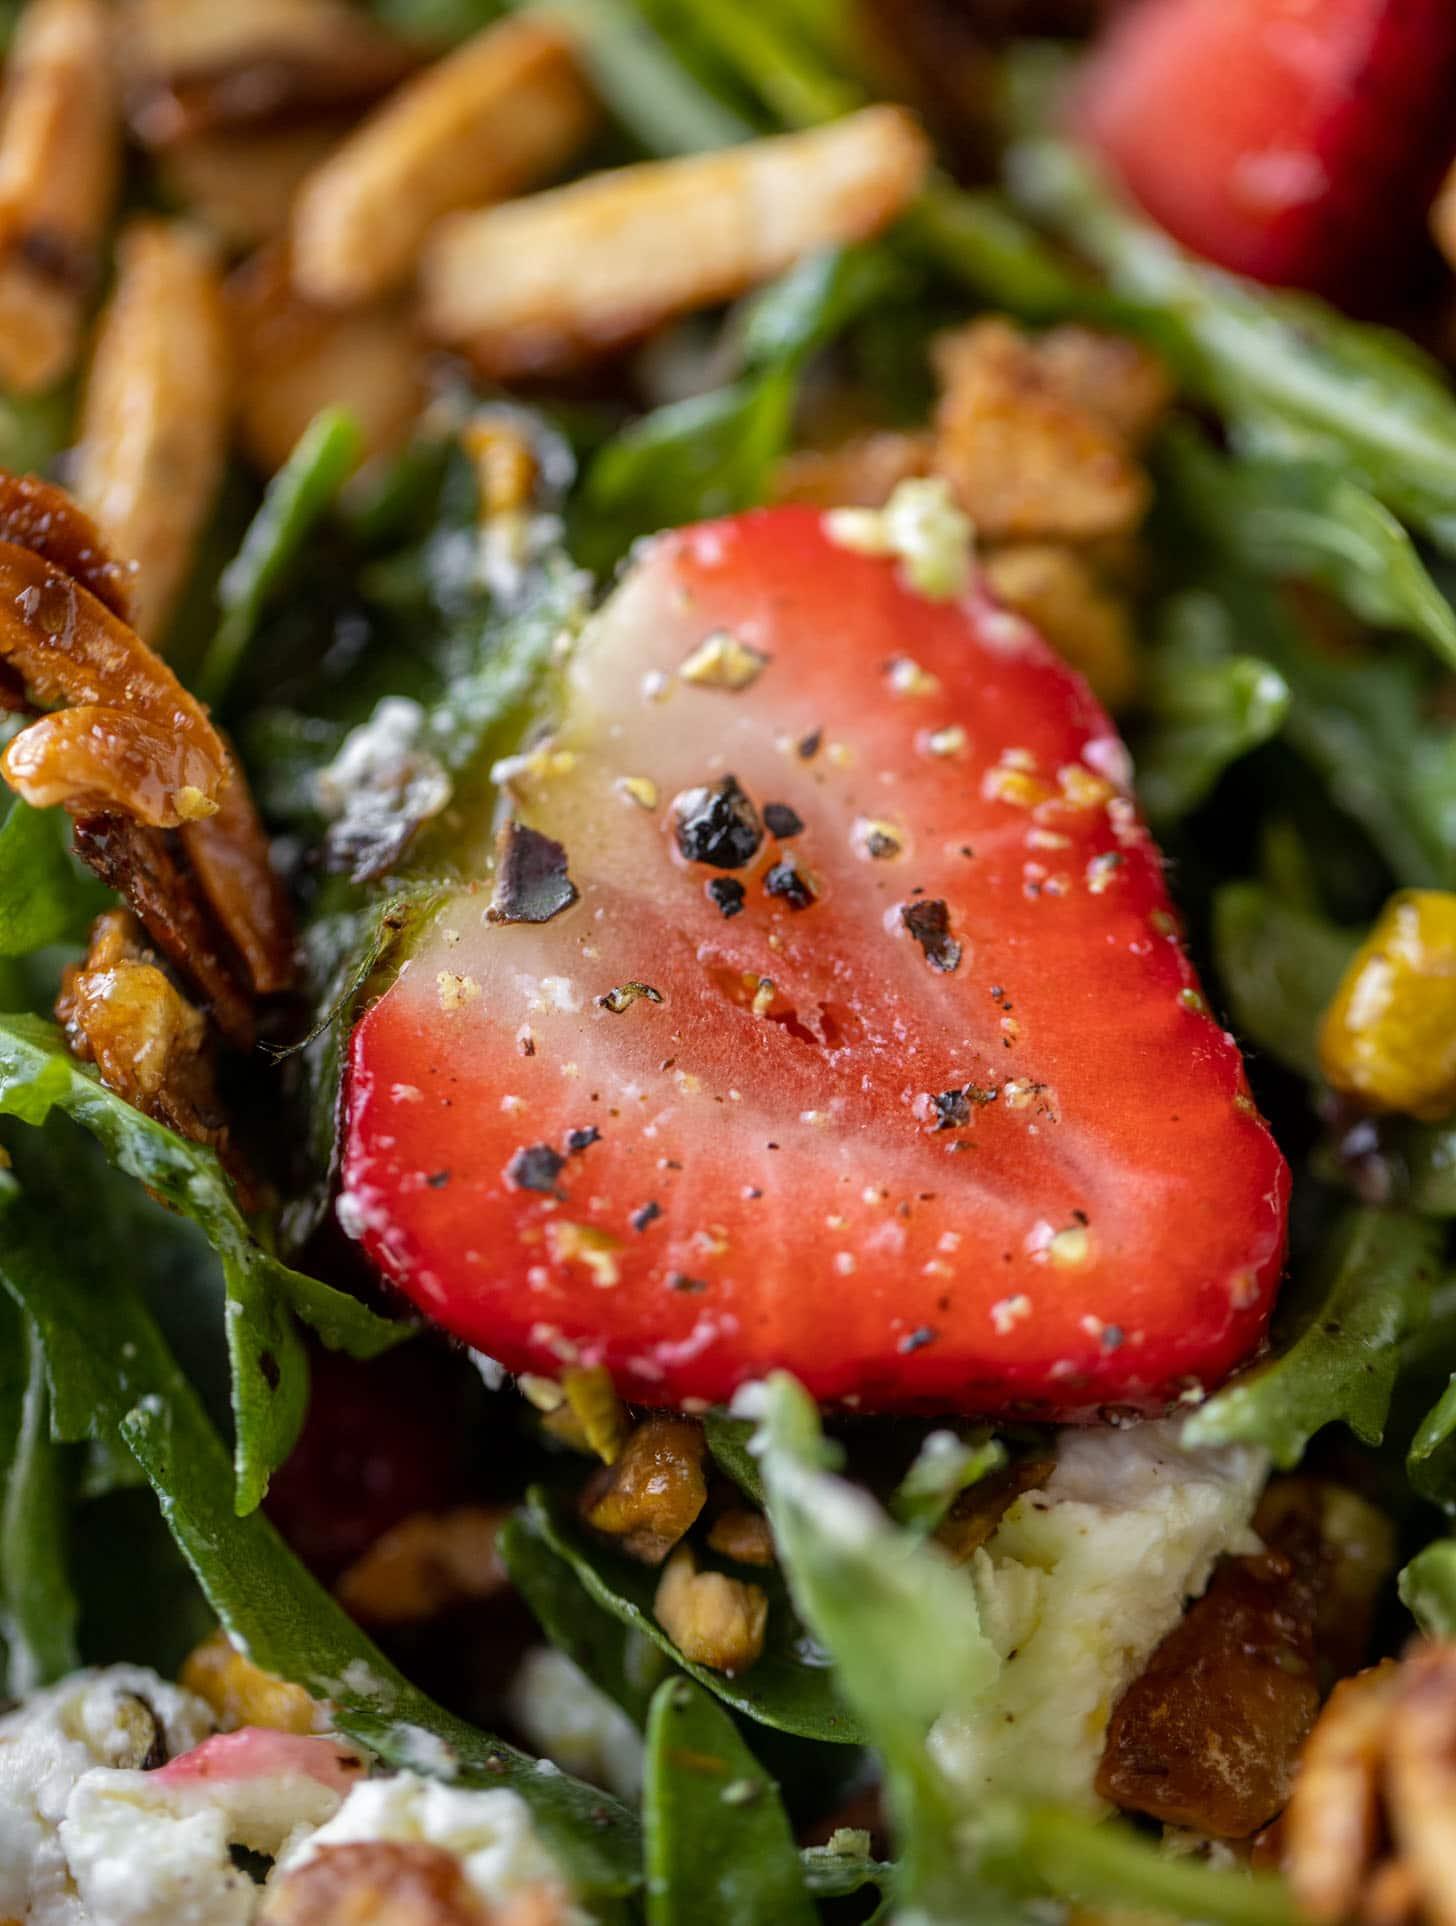 up close strawberry salad